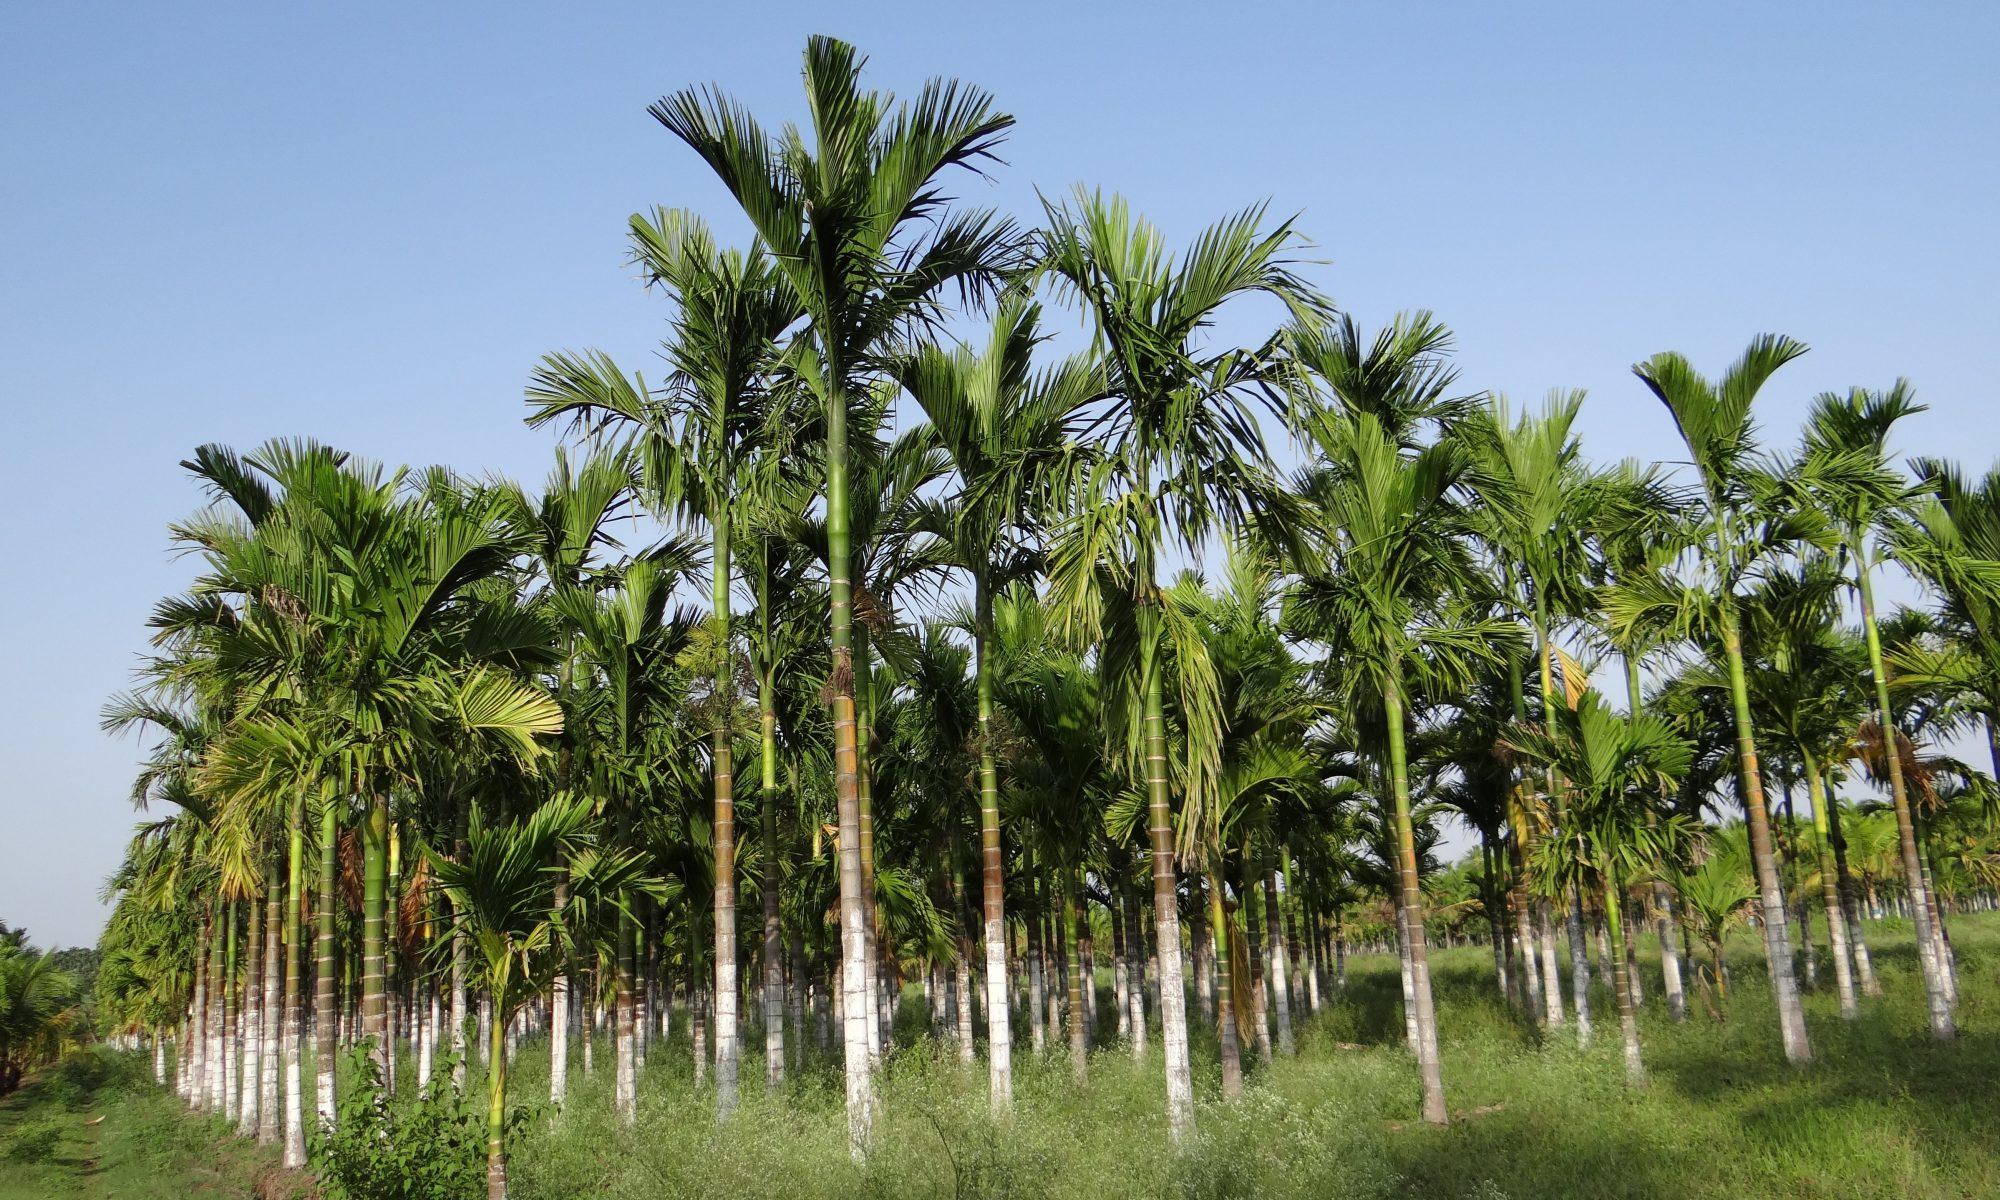 tree-plant-botany-agriculture-flora-vegetation-1102671-pxhere.com